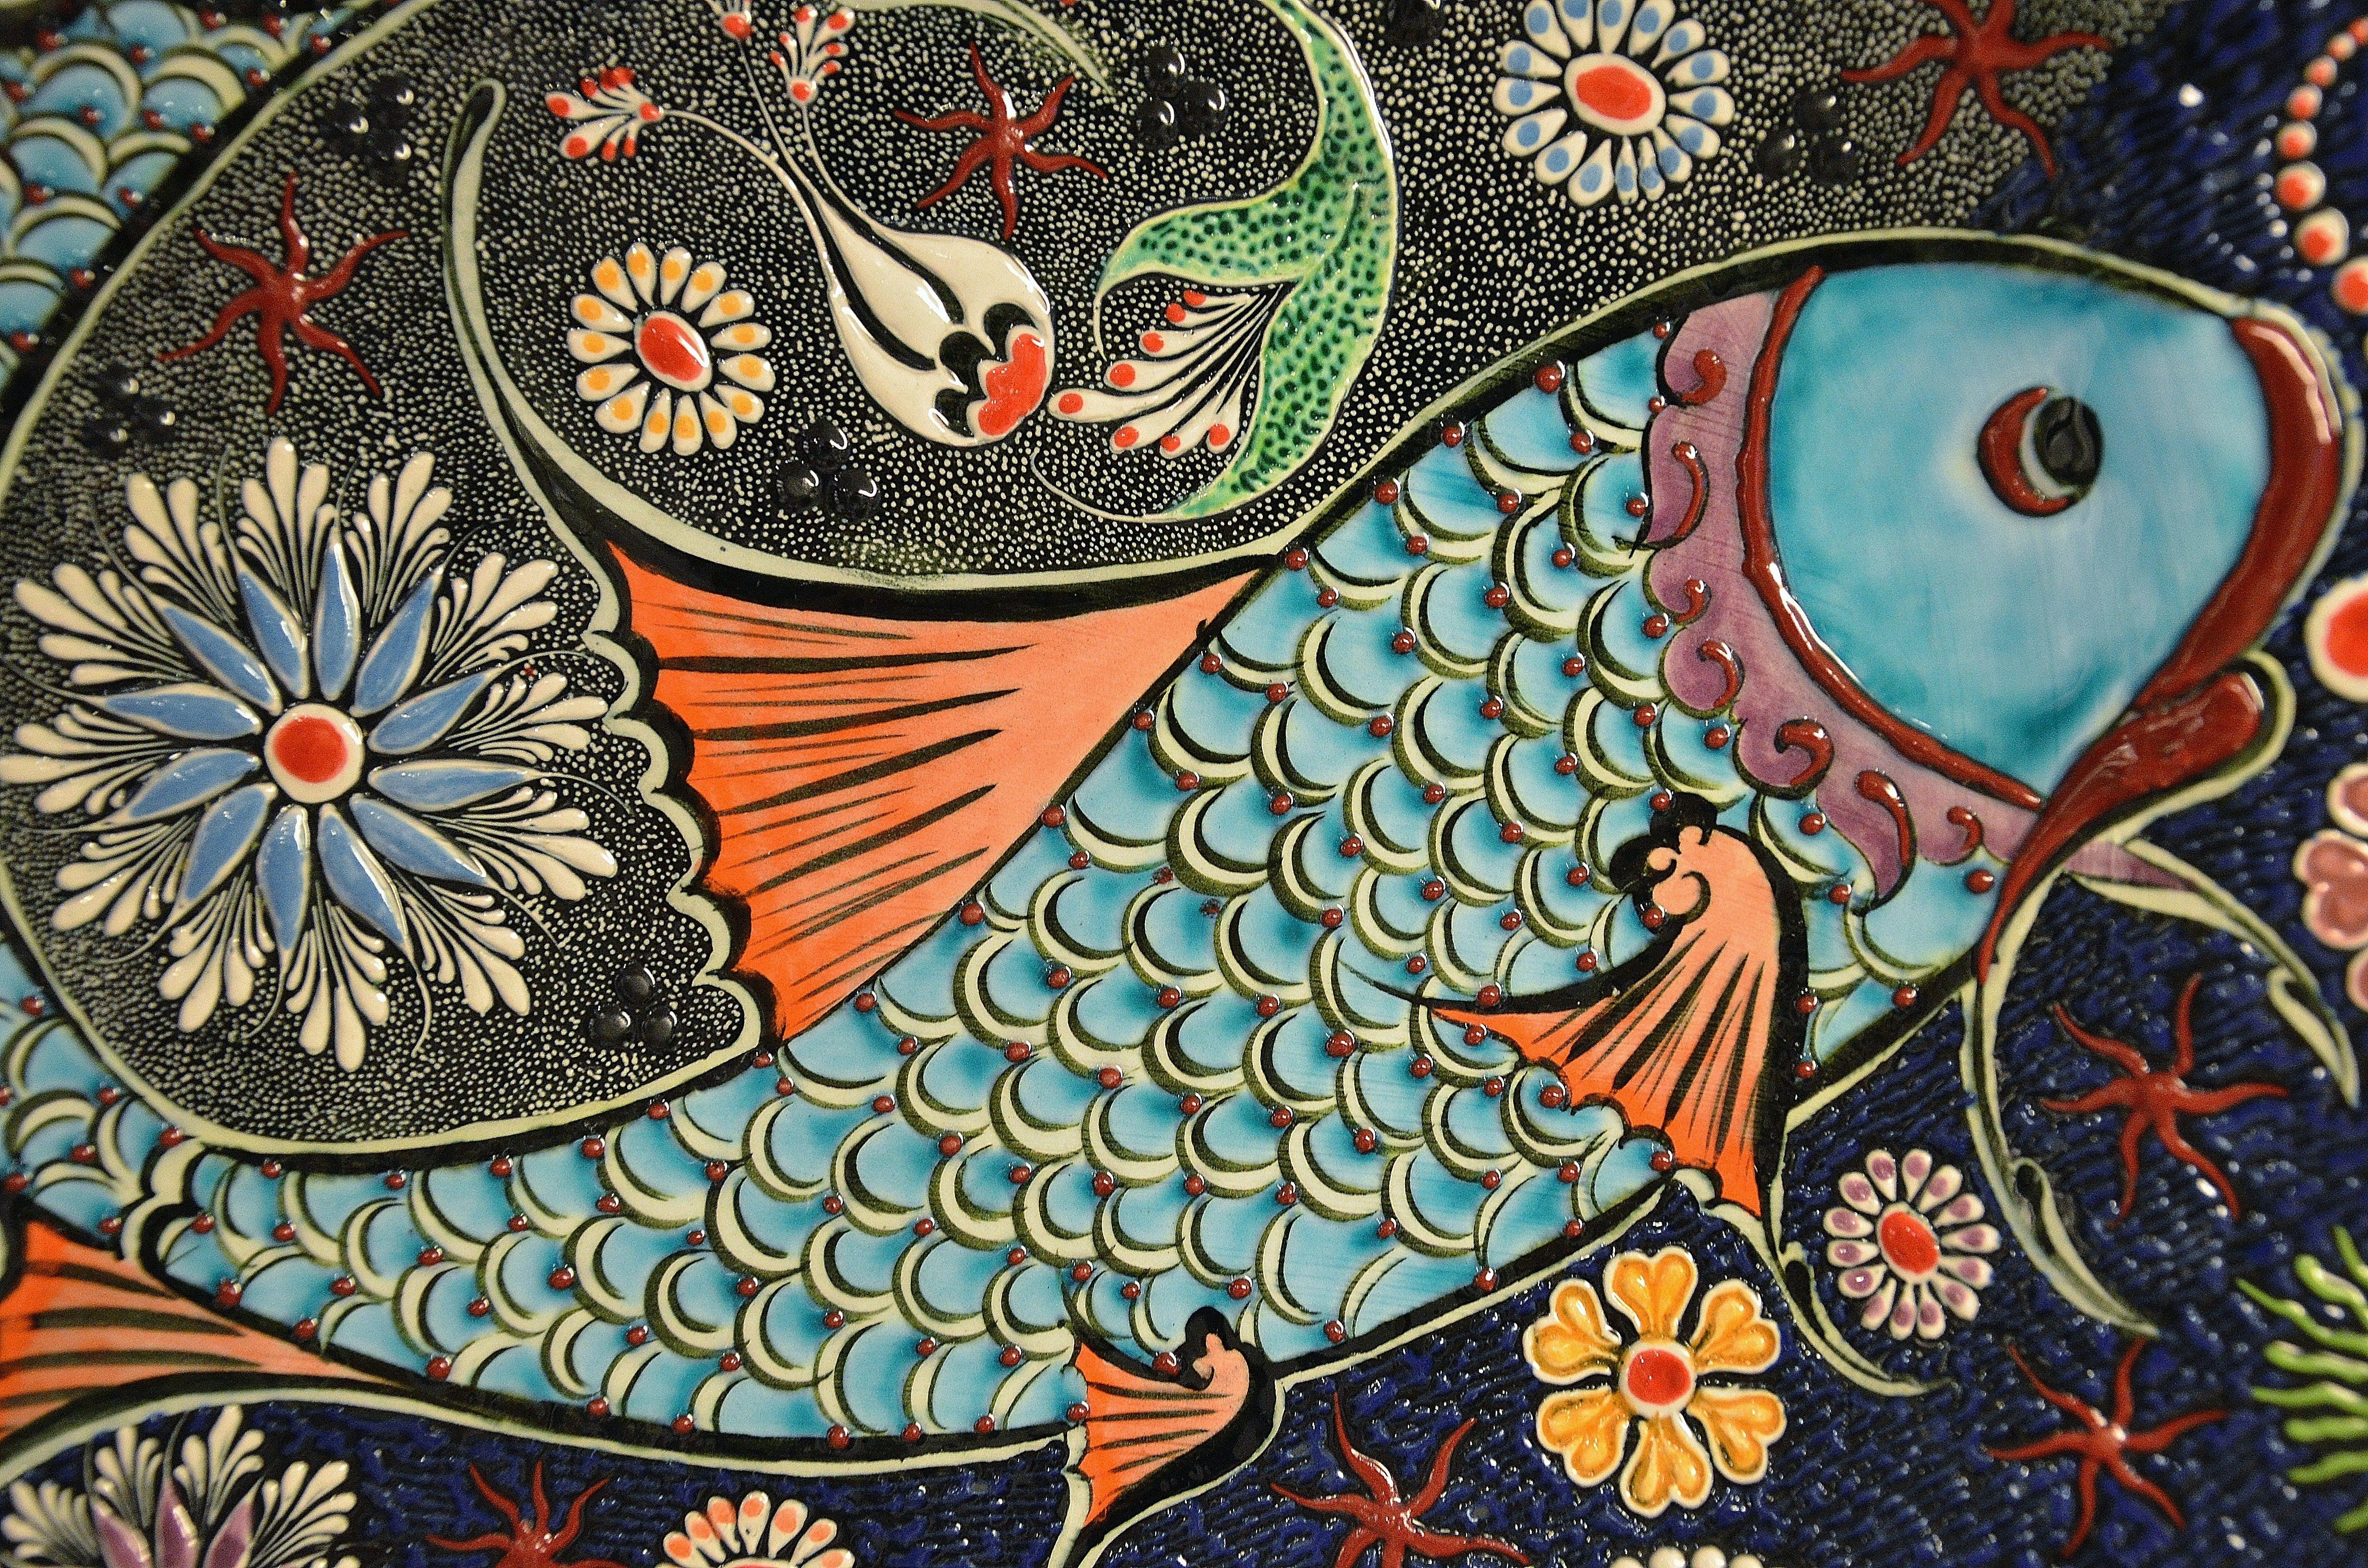 Free images pencil pattern ceramic artistic tile colorful pencil pattern ceramic artistic tile colorful artwork painting flowers art illustration design decorative mosaic mural colours dailygadgetfo Gallery